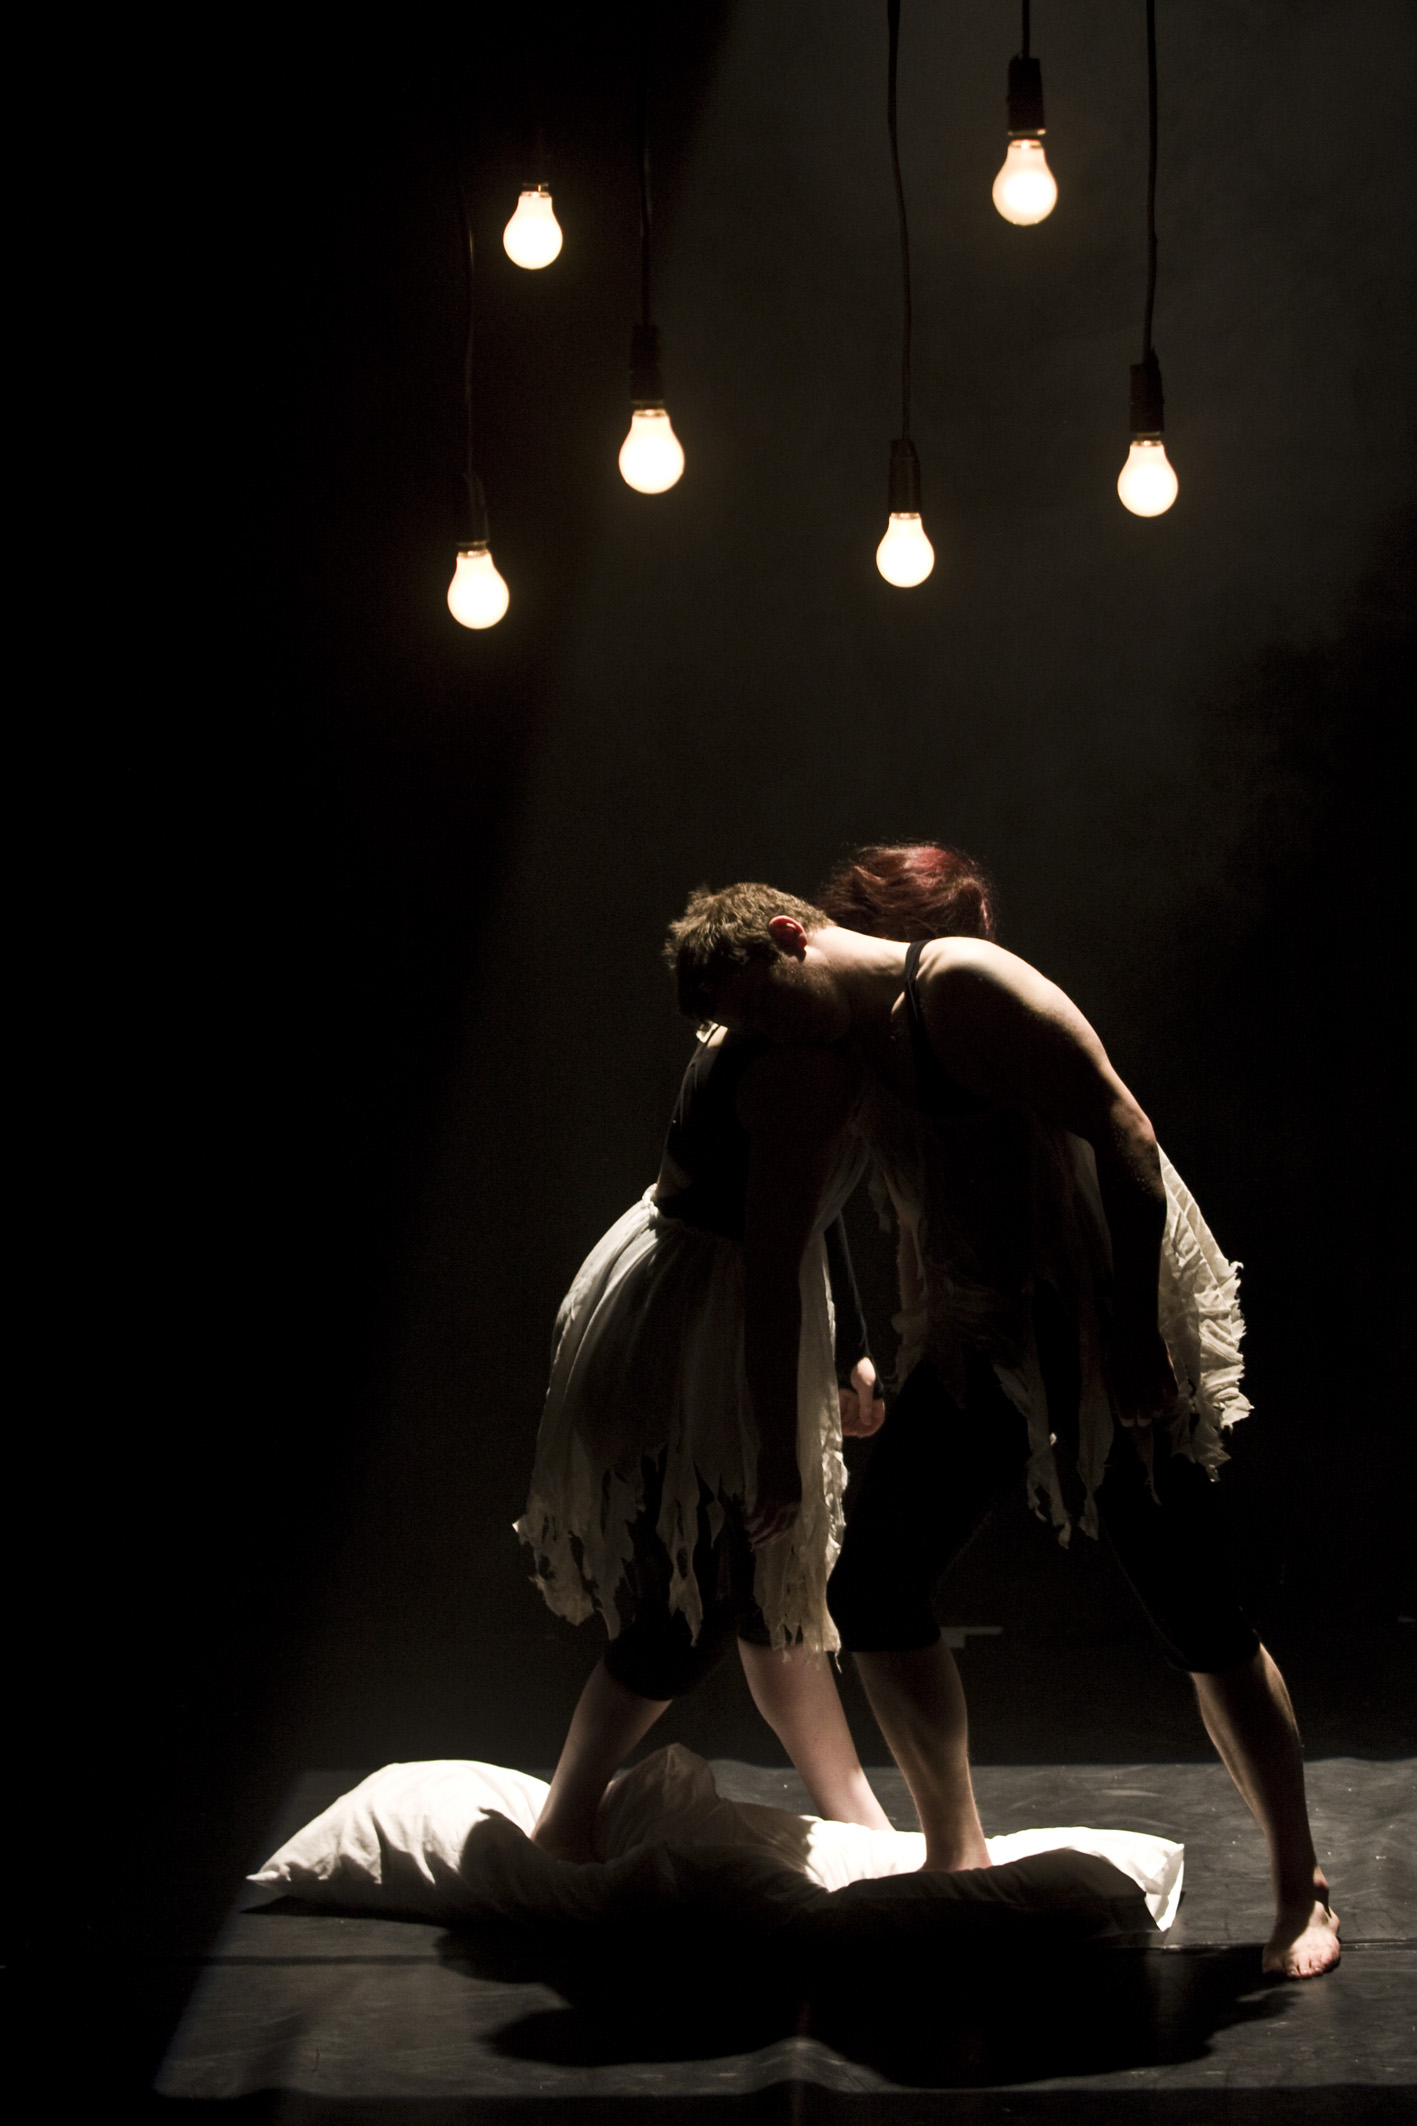 http://www.danceahead.co.uk/wp-content/uploads/2018/05/ATBOR15.jpg